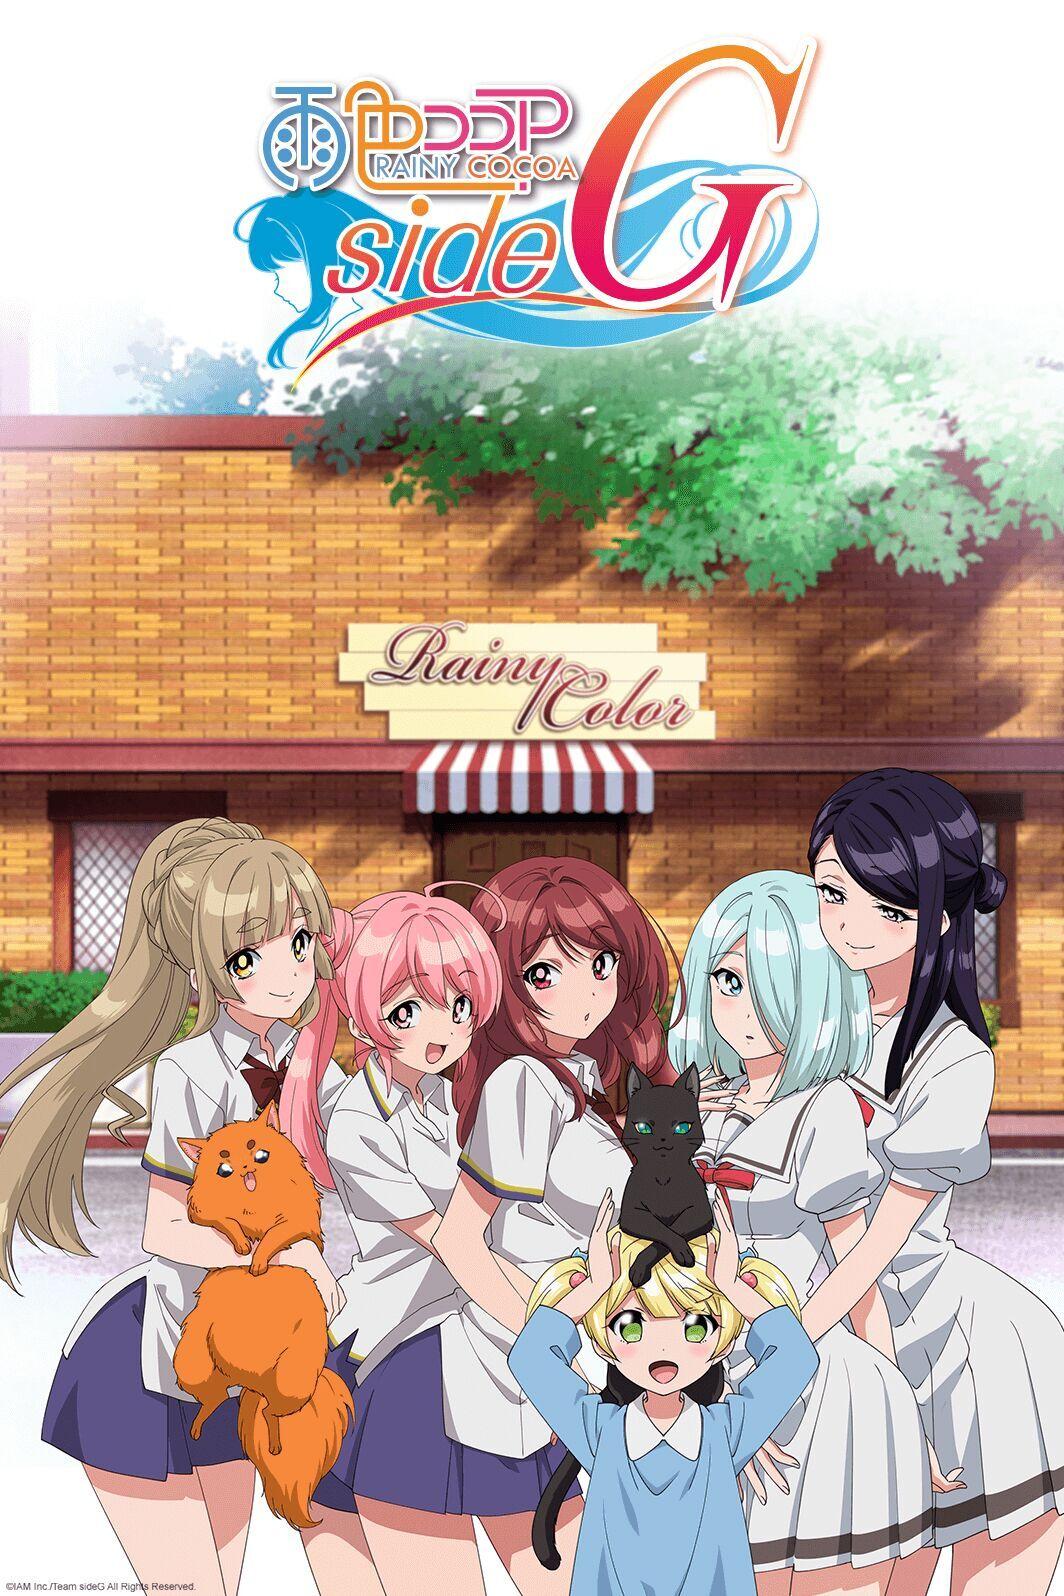 Rainy Cocoa SideG - Anime